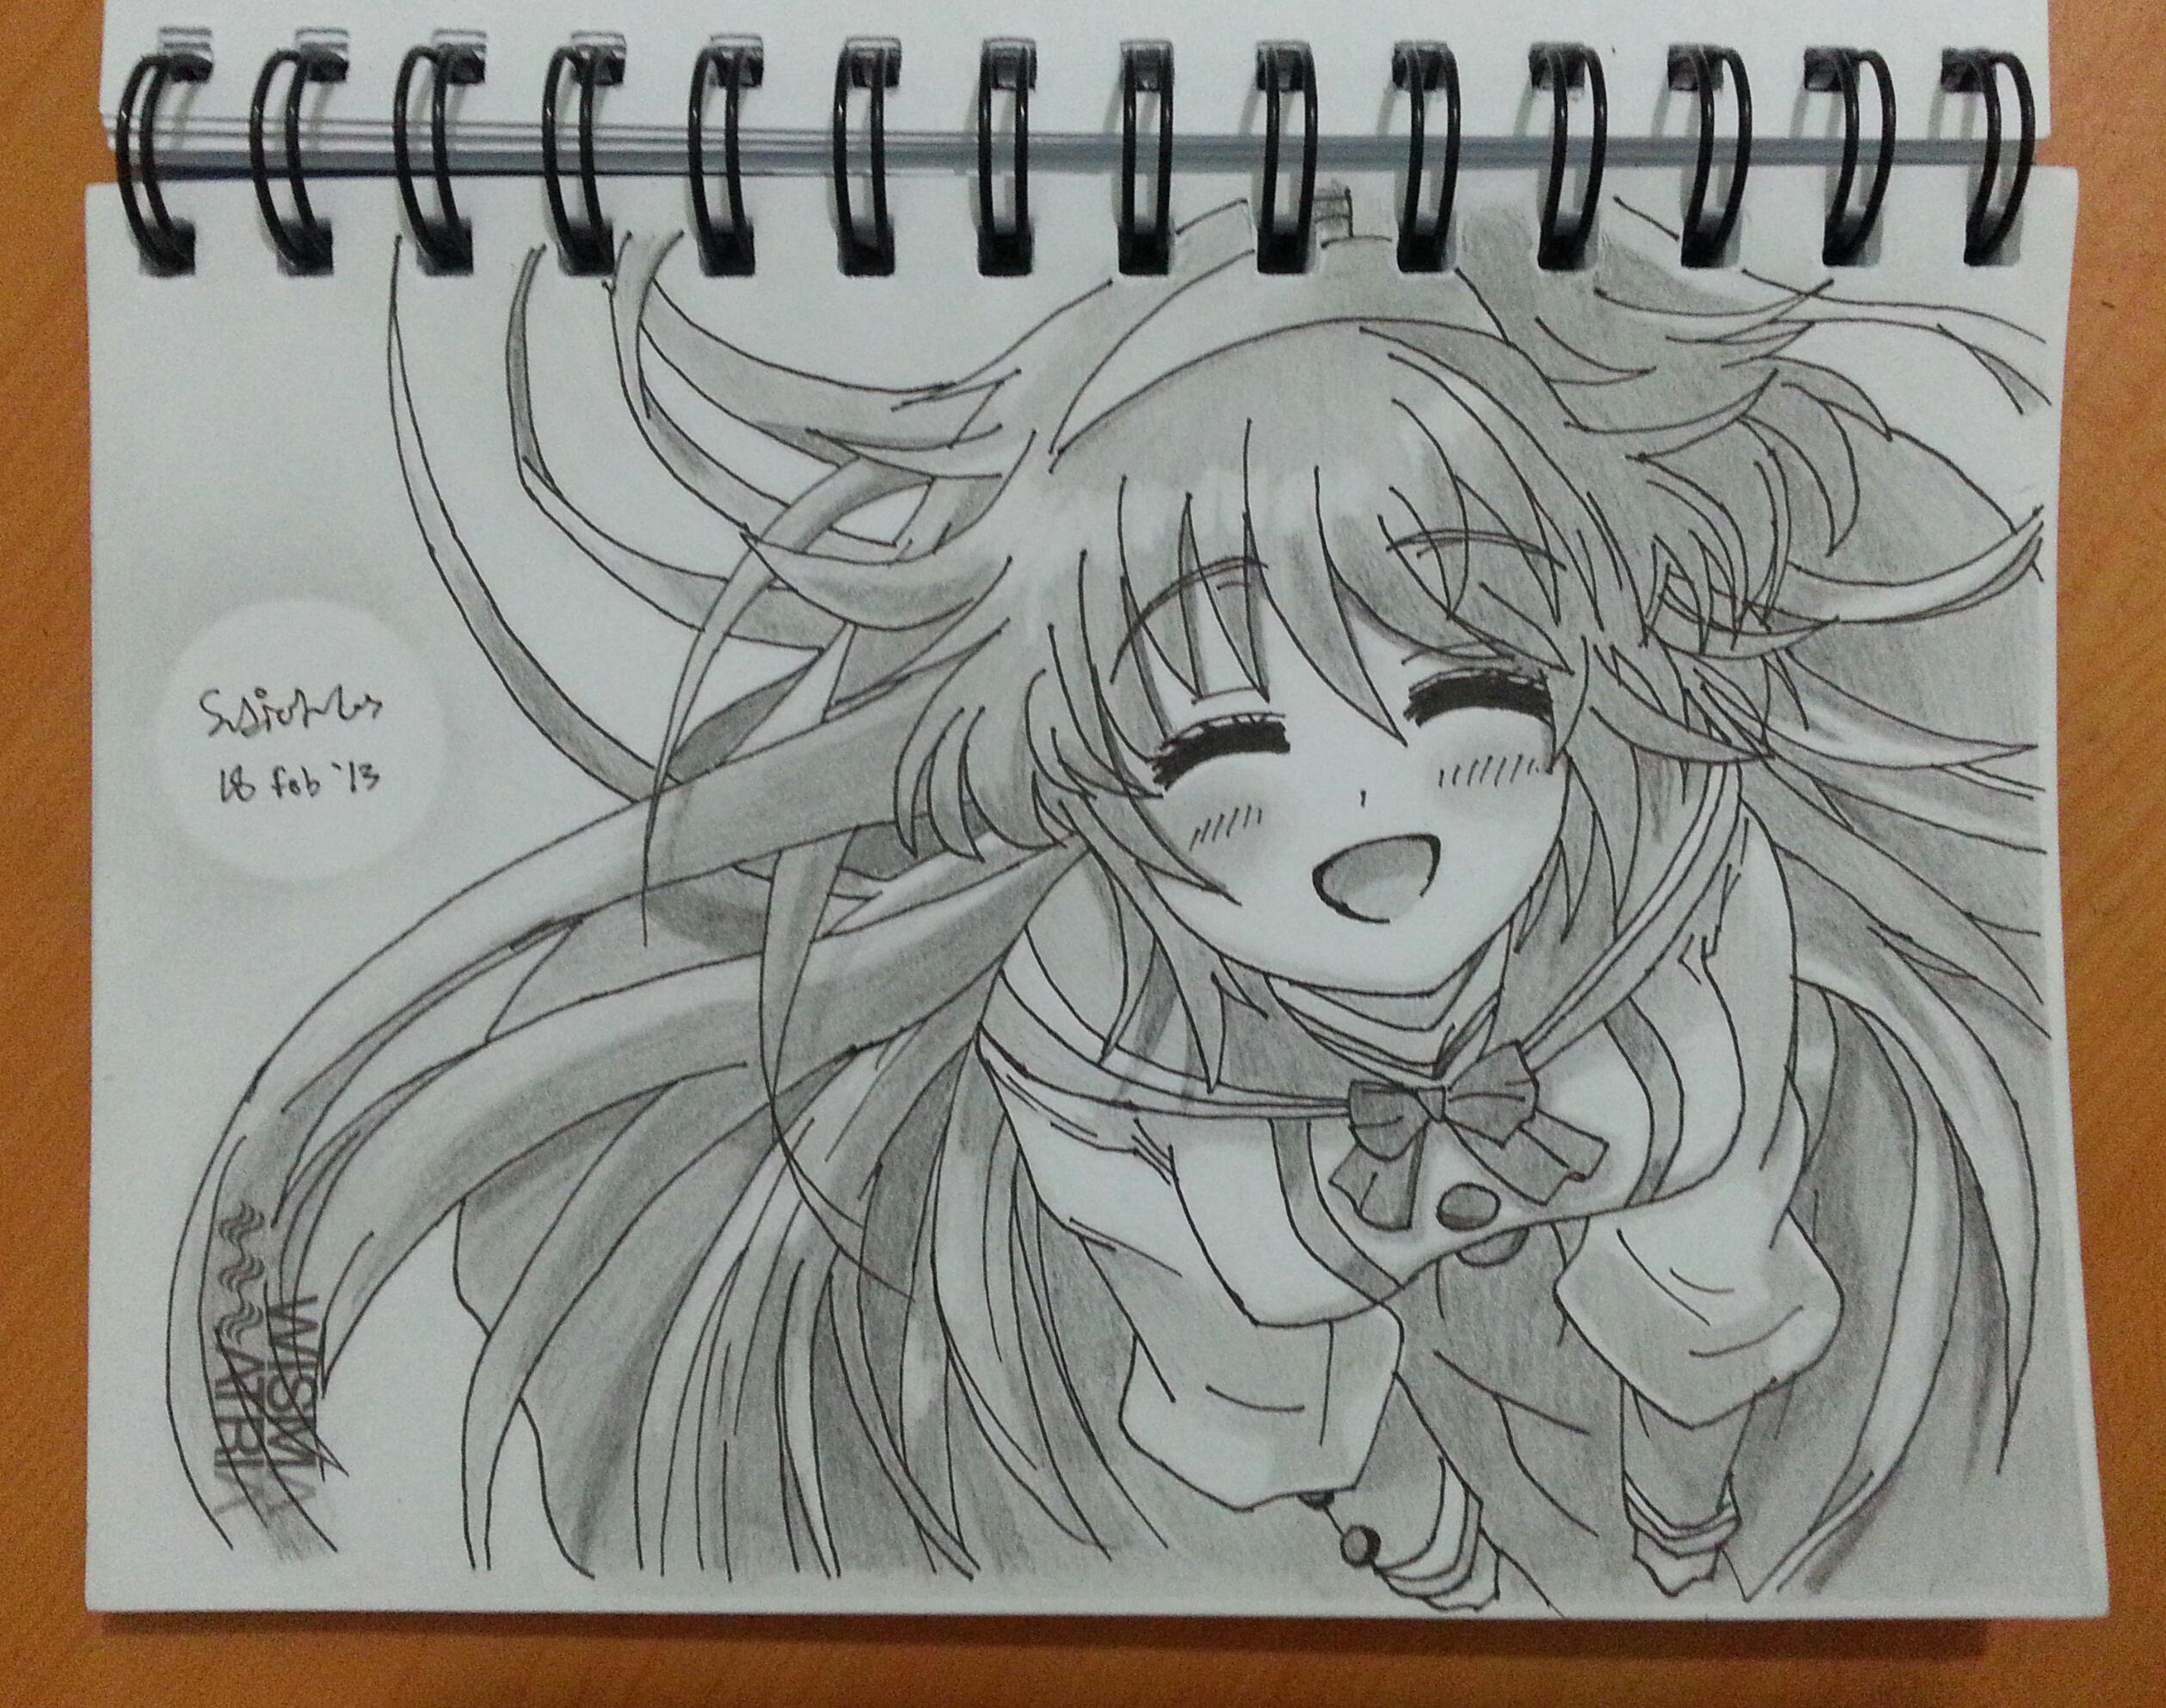 Cute Kawaii Sweet Smile Anime Girl by SudiLin on DeviantArt